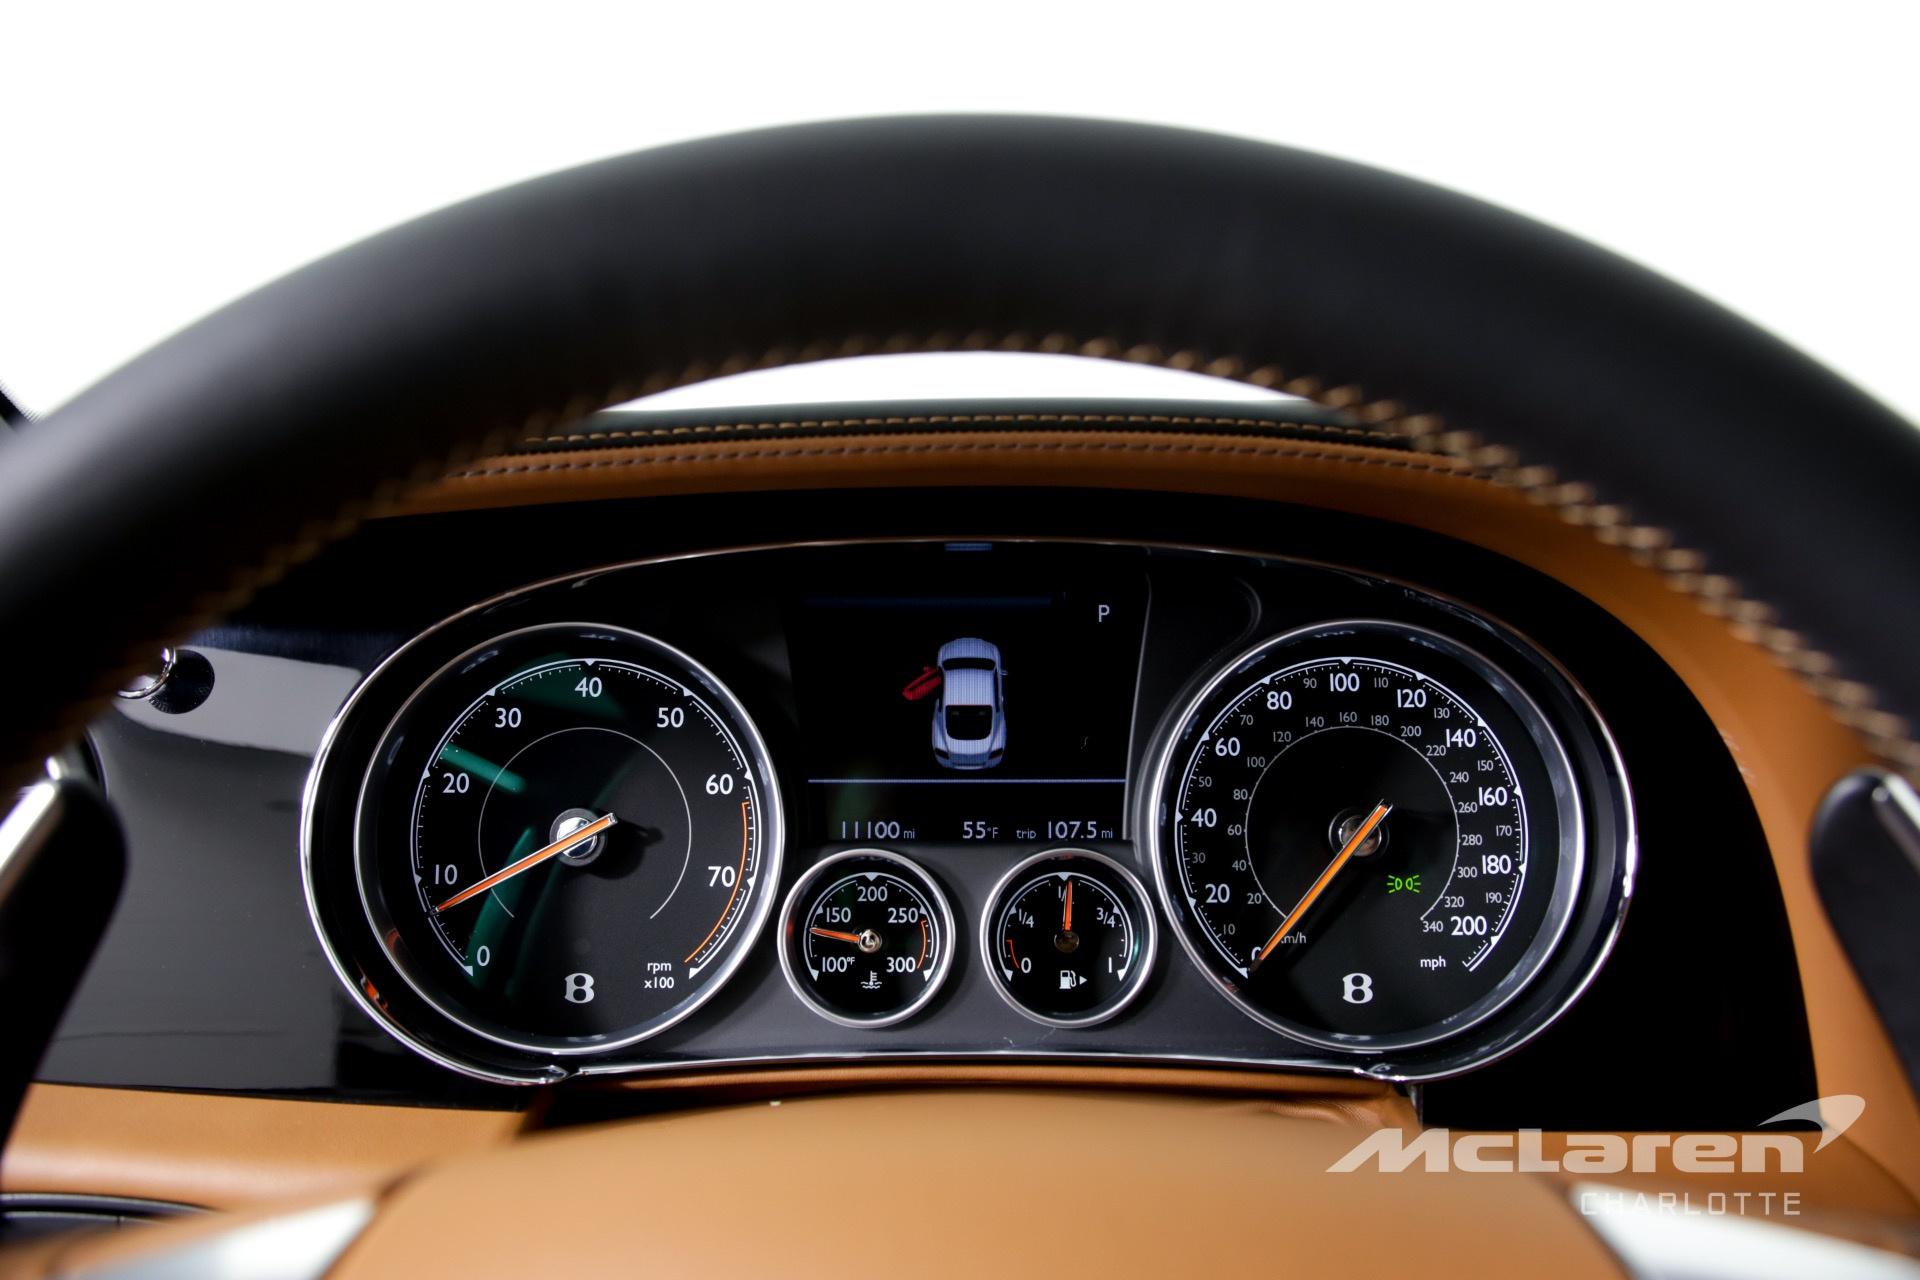 Used 2016 Bentley Continental Gt V8 For Sale 124 996 Mclaren